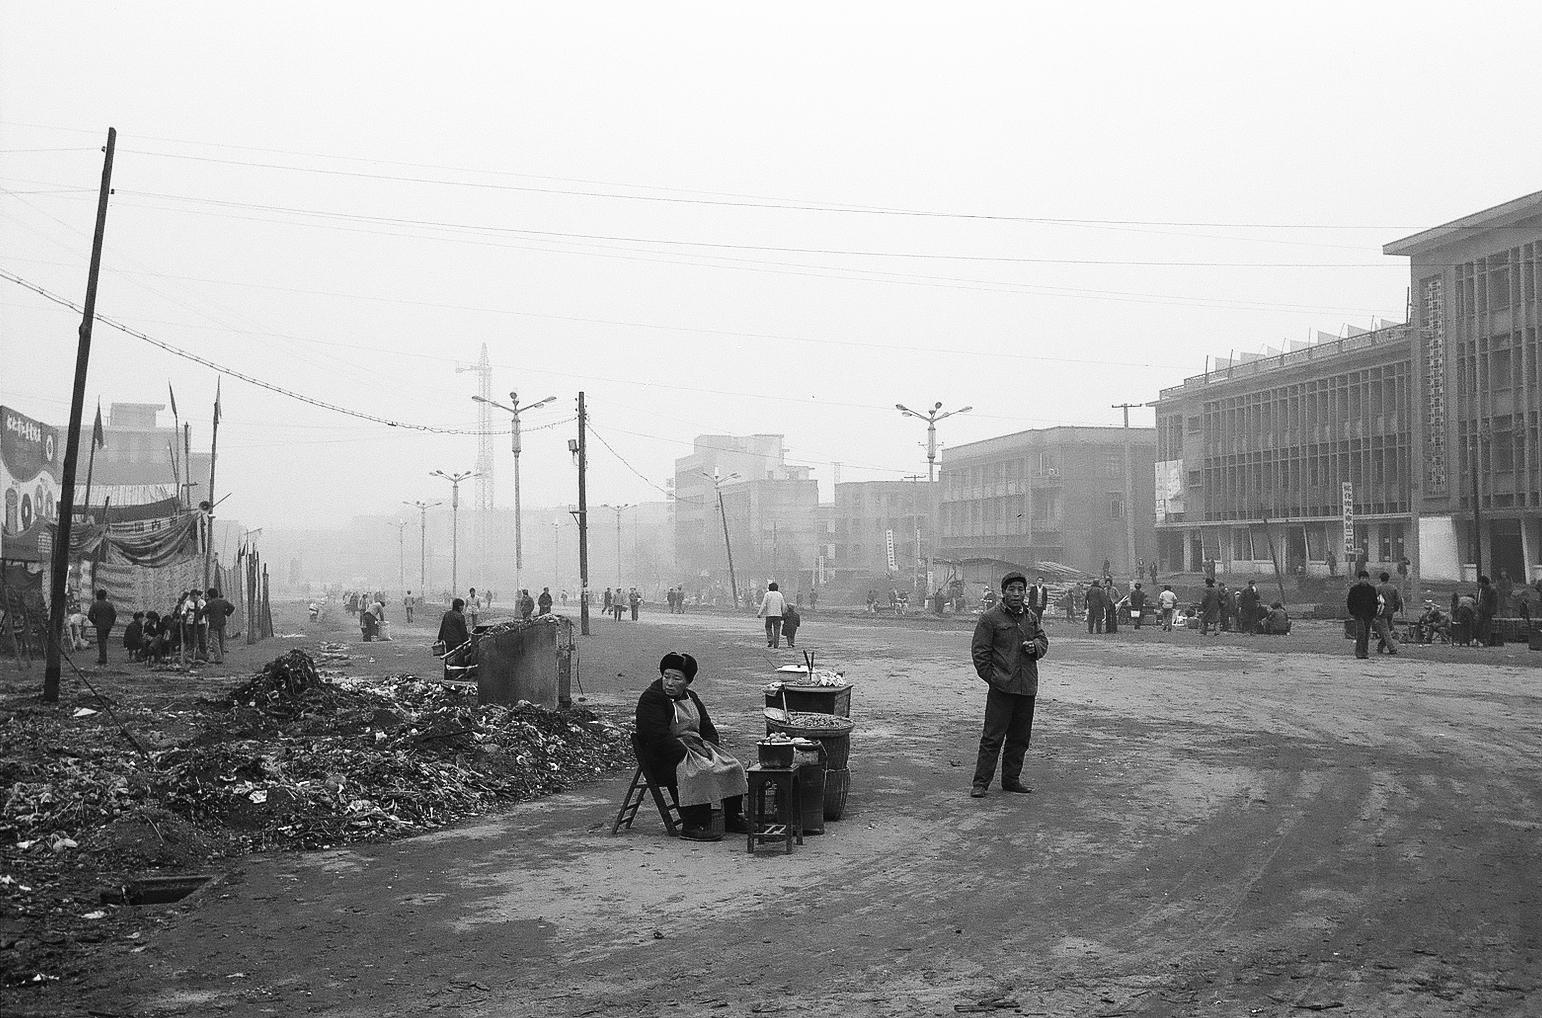 China, 1985, Wuhan